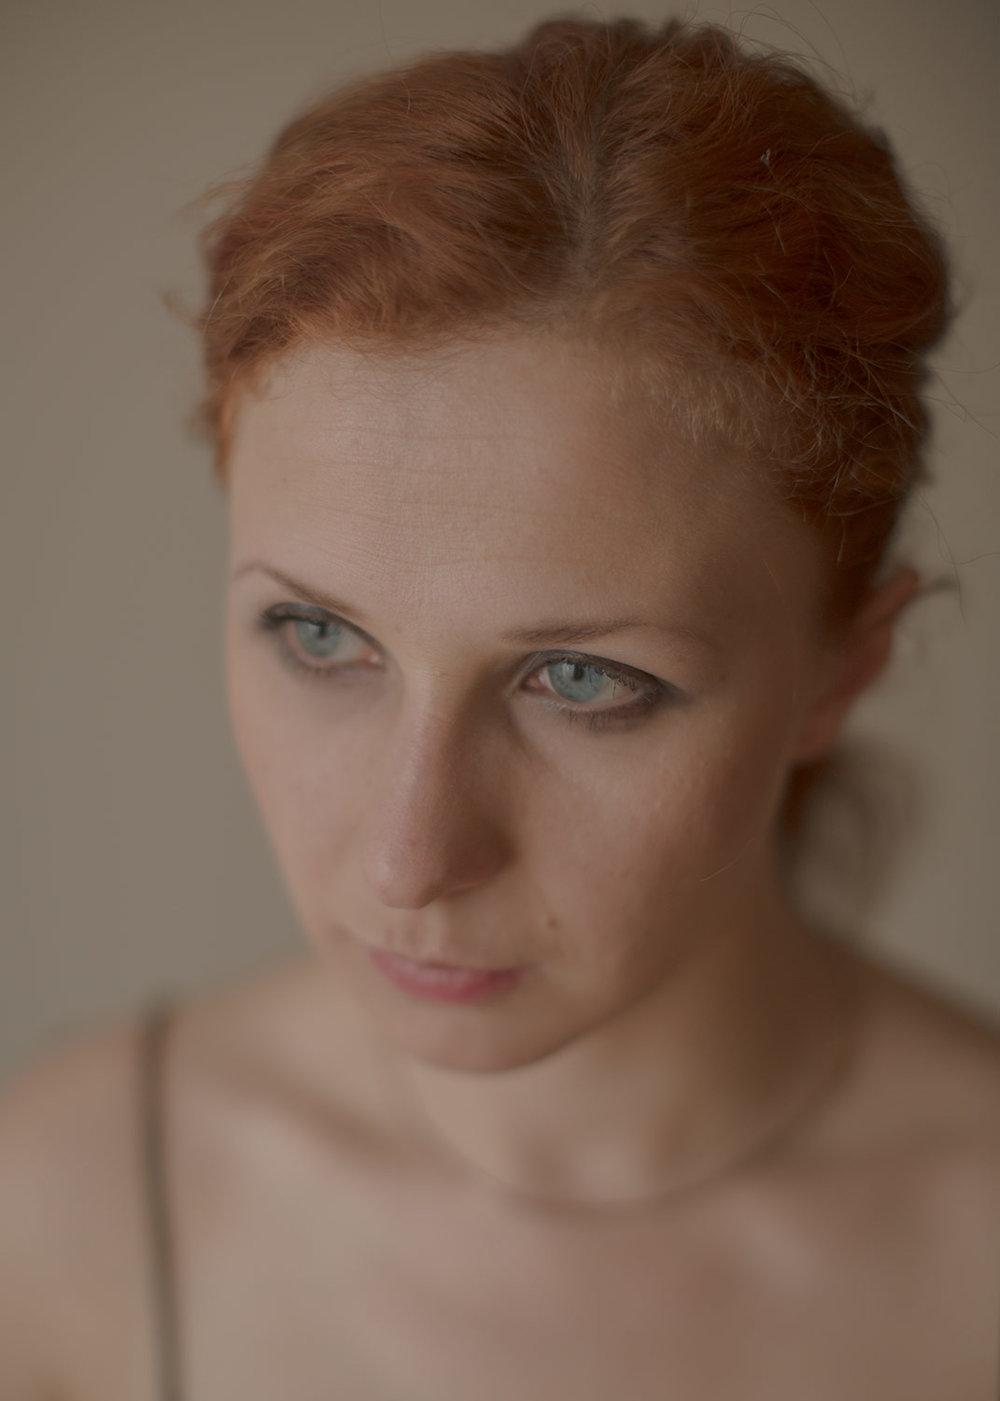 Masha Alyokhina of Pussy Riot